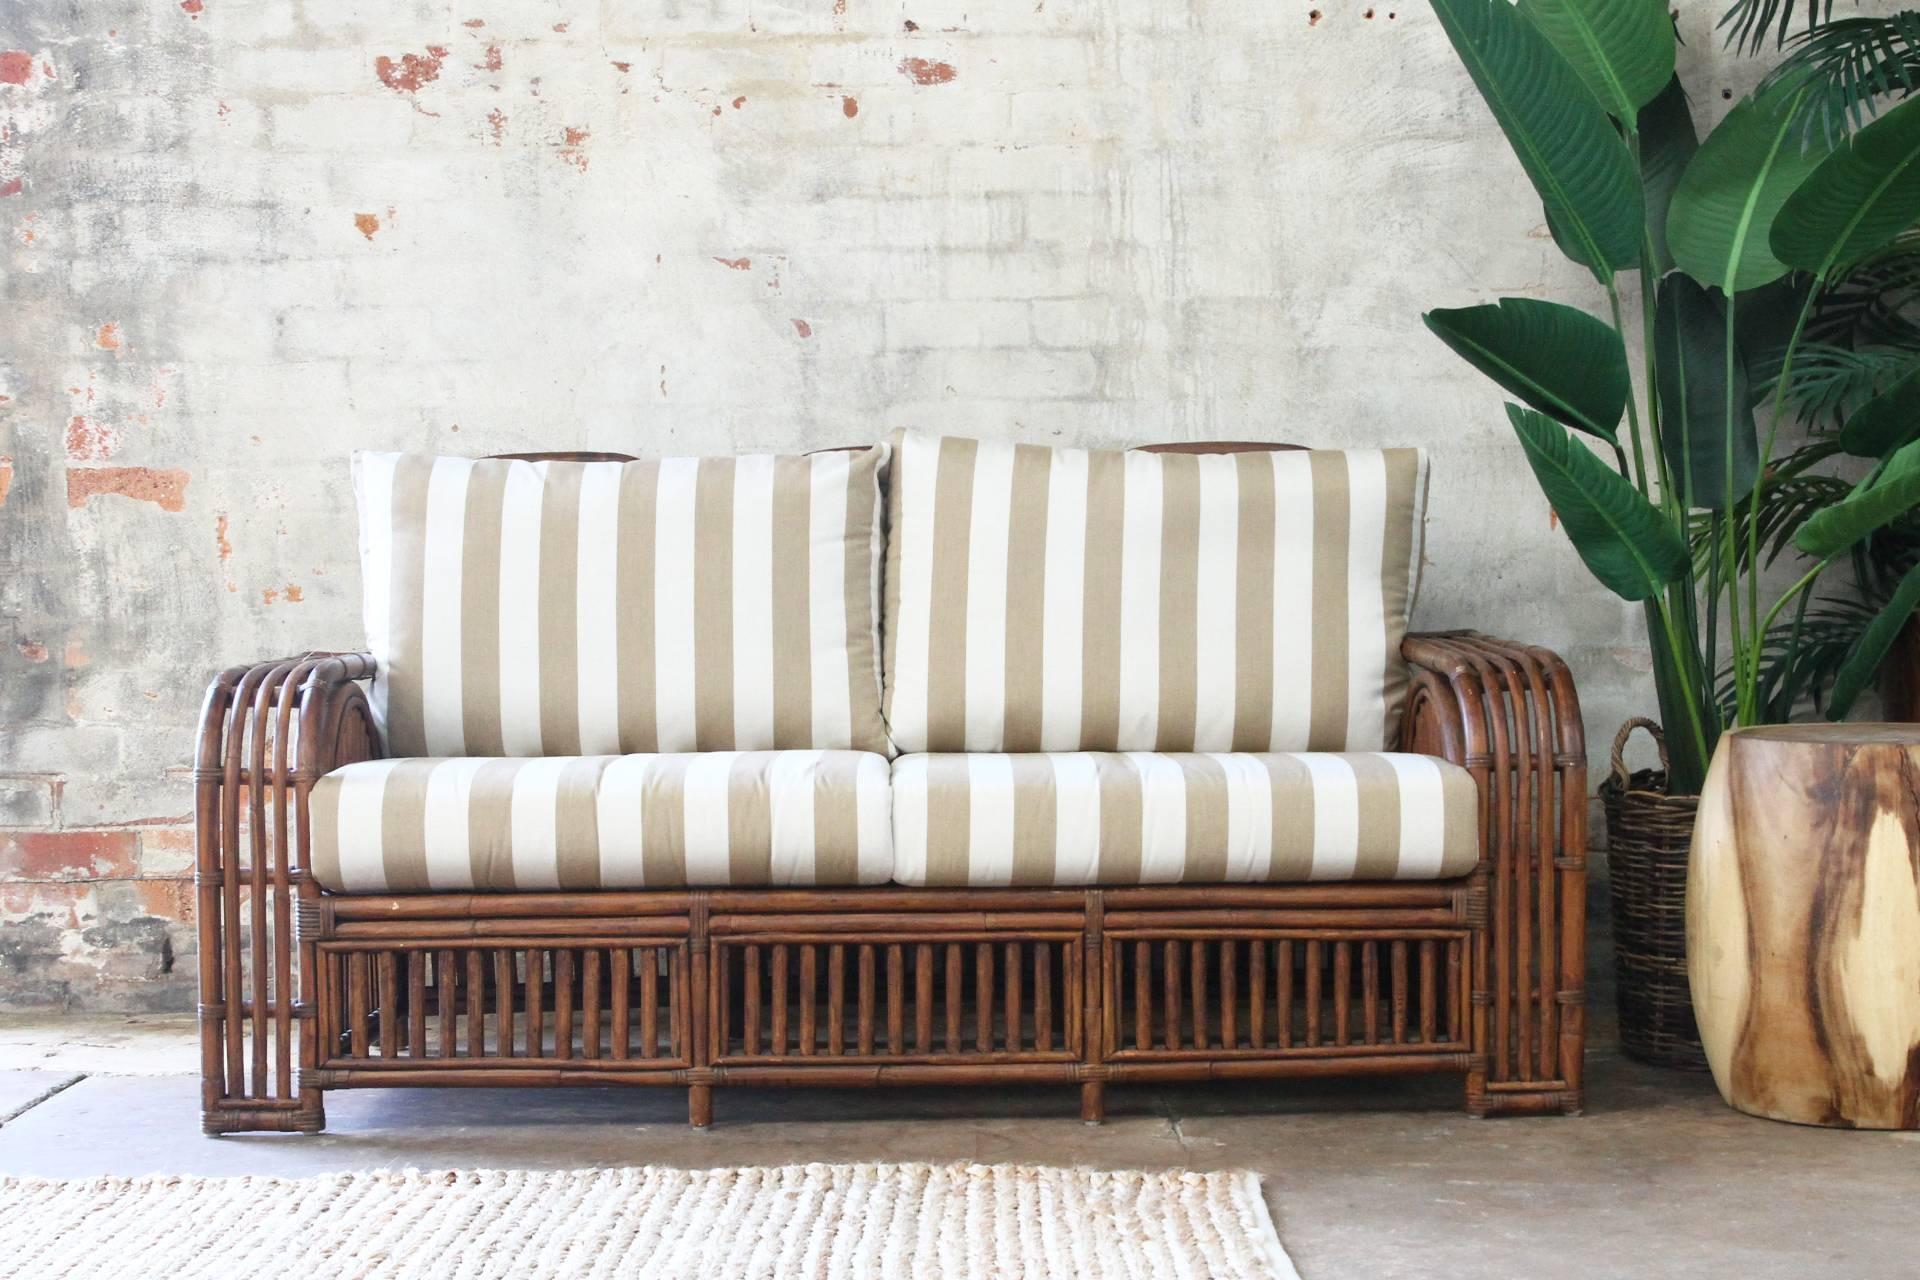 White Cane Furniture | Naturally Cane Rattan And Wicker Furniture regarding White Cane Sofas (Image 30 of 30)